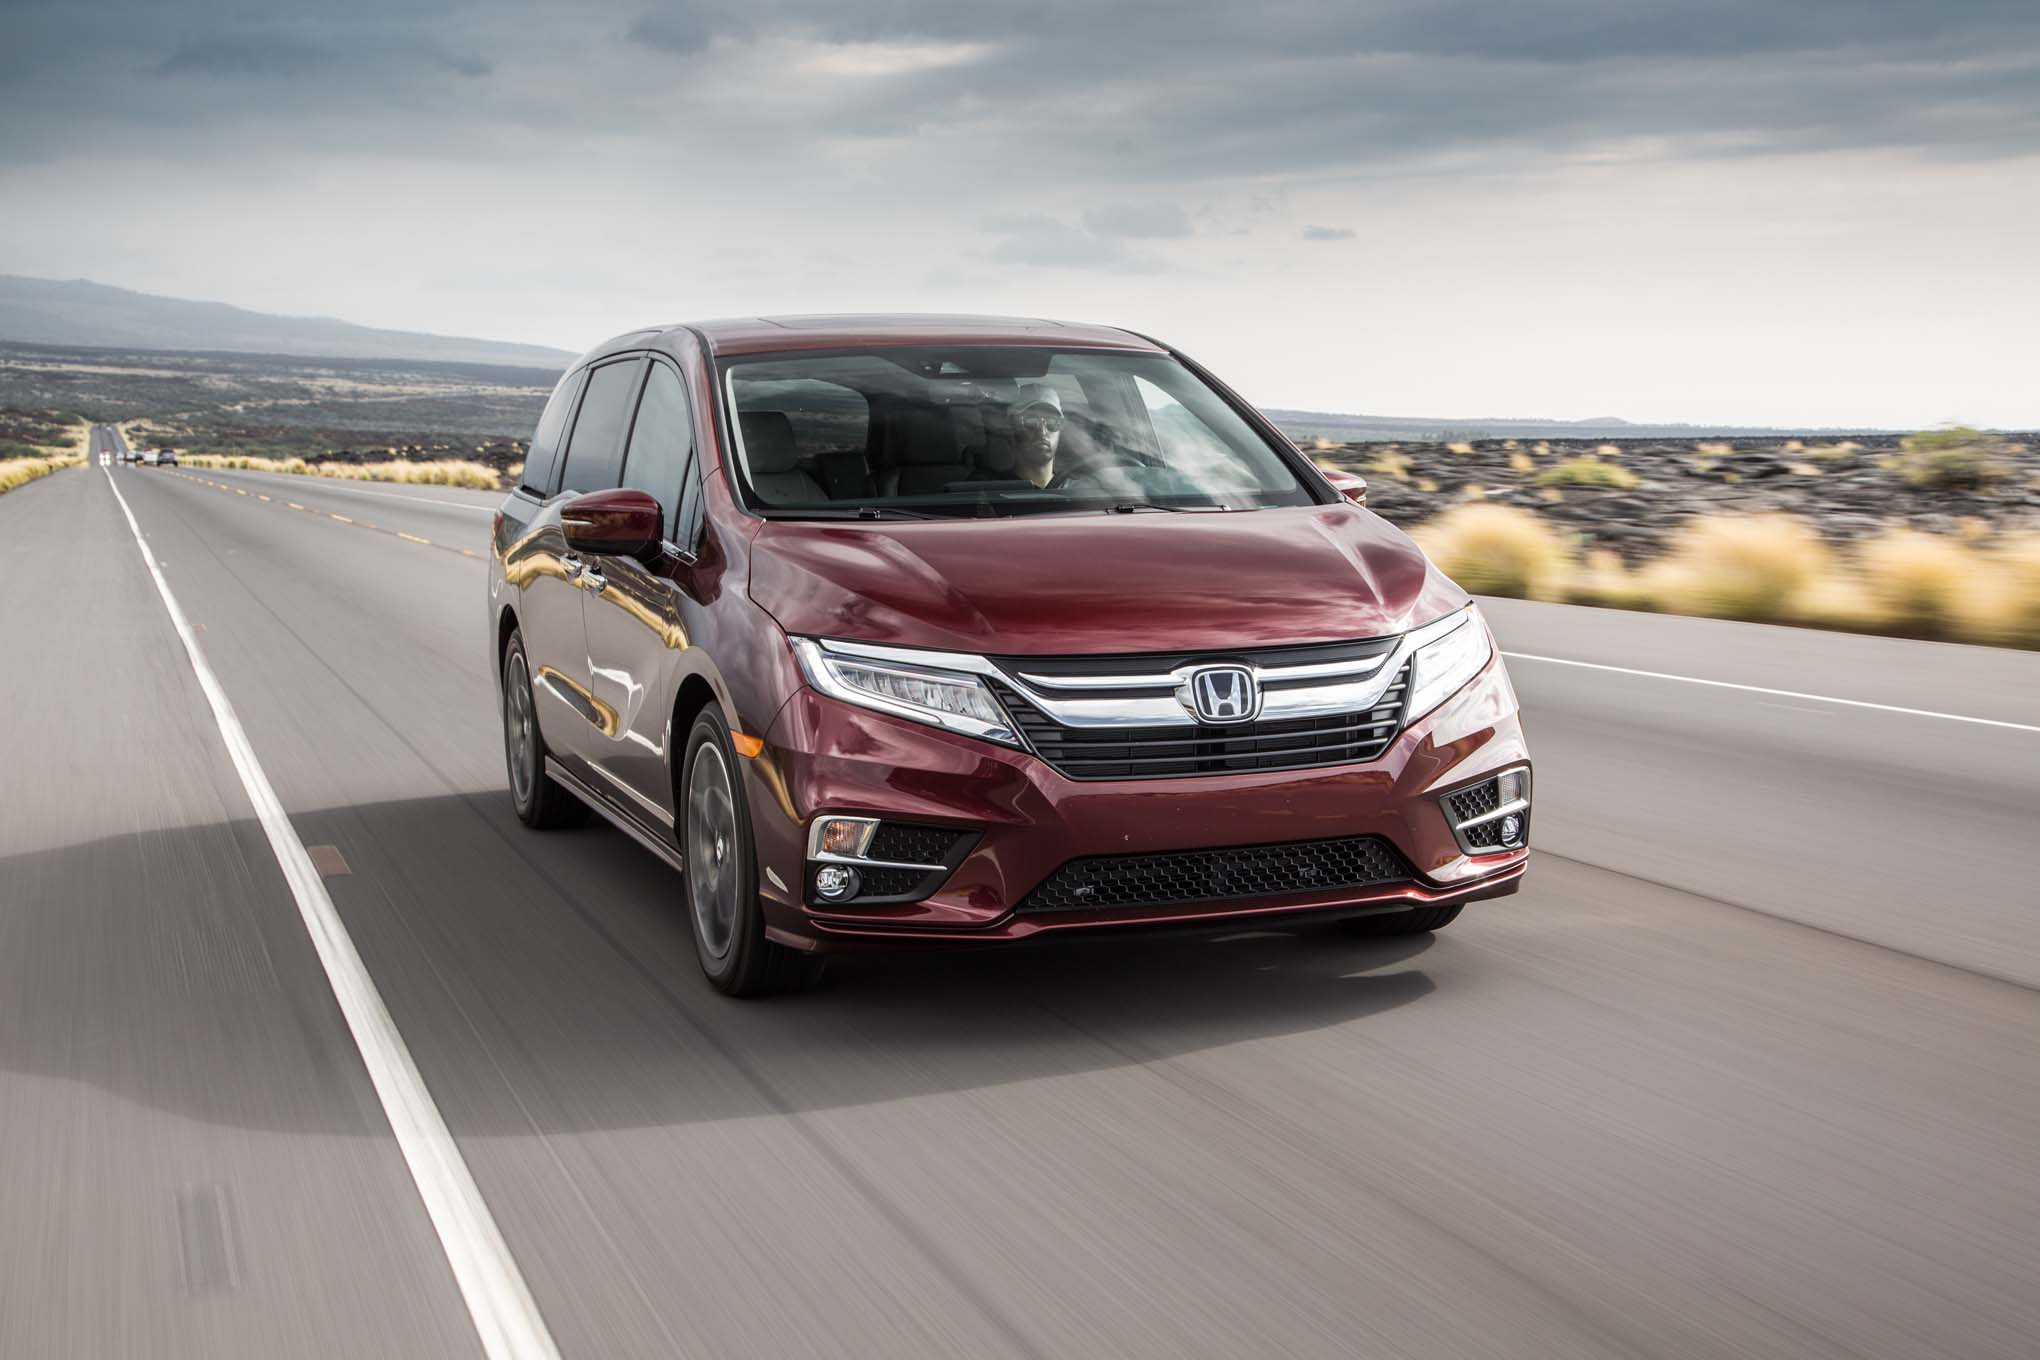 2018 Honda Odyssey Front Three Quarter In Motion 02